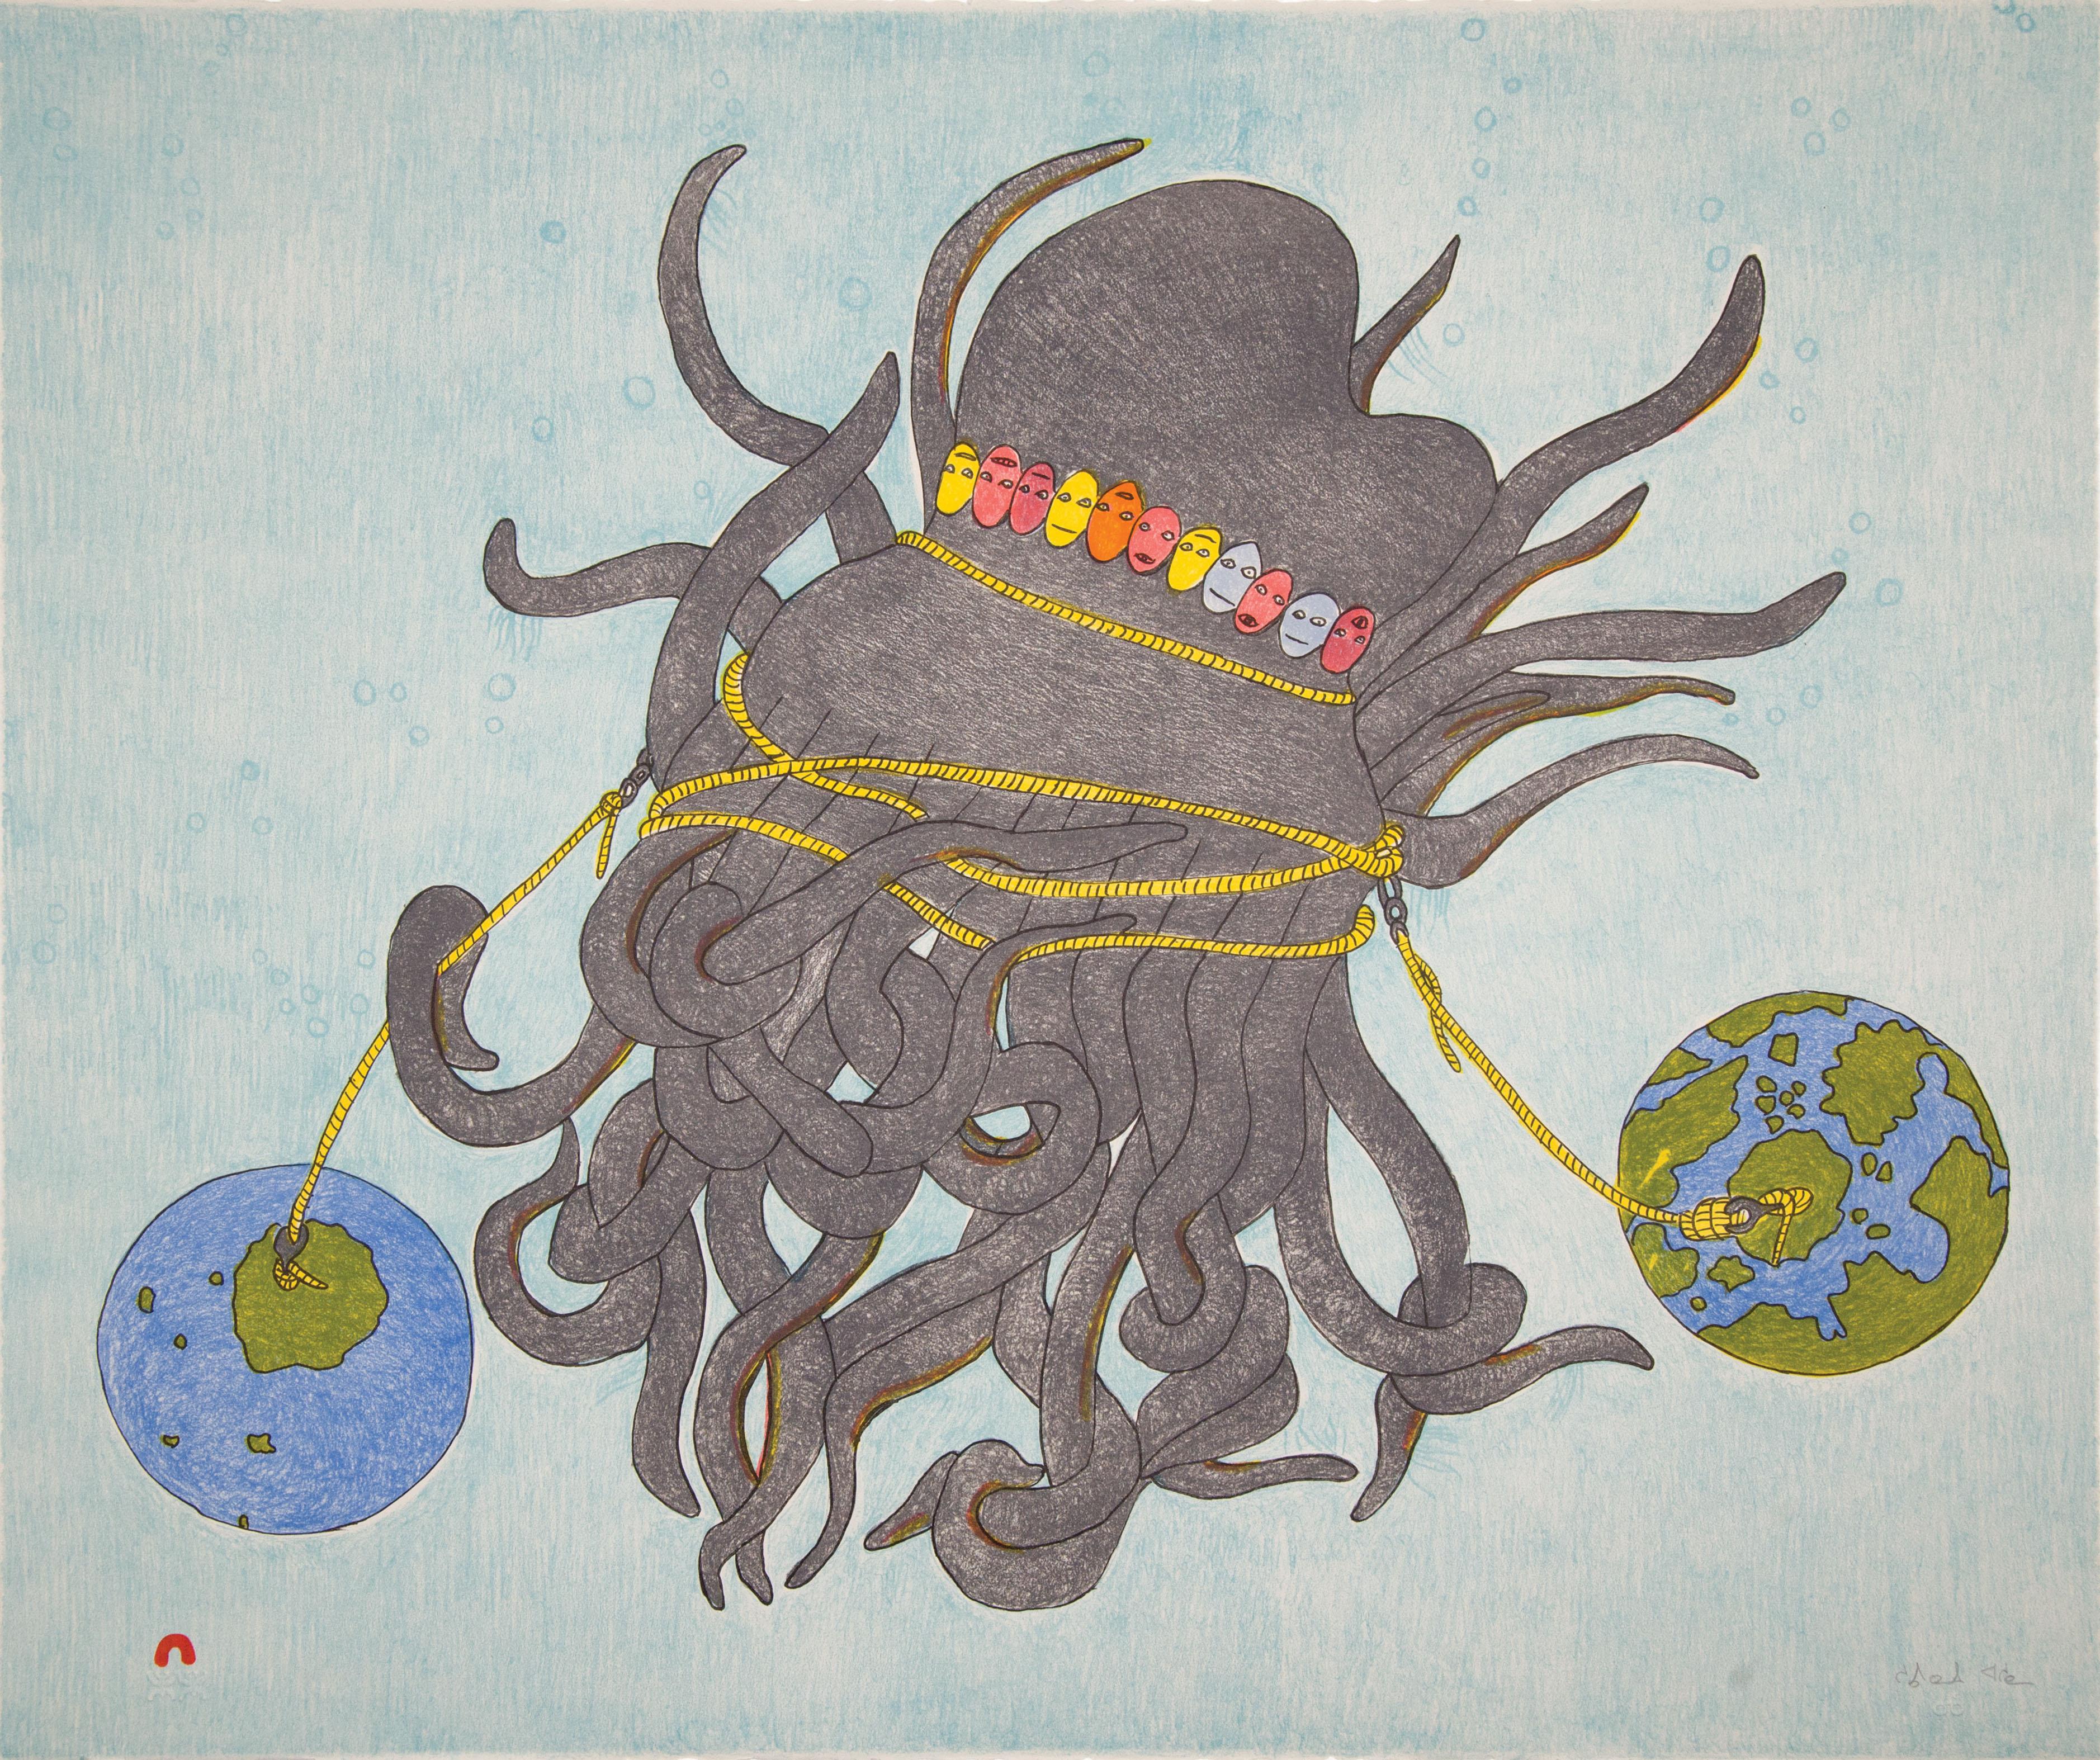 SHUVINAI ASHOONA Tentacles Lithograph Printer: Niveaksie Quvianaqtuliaq 57 x 66.5 cm; 22 1/2 x 26 in. $640 US